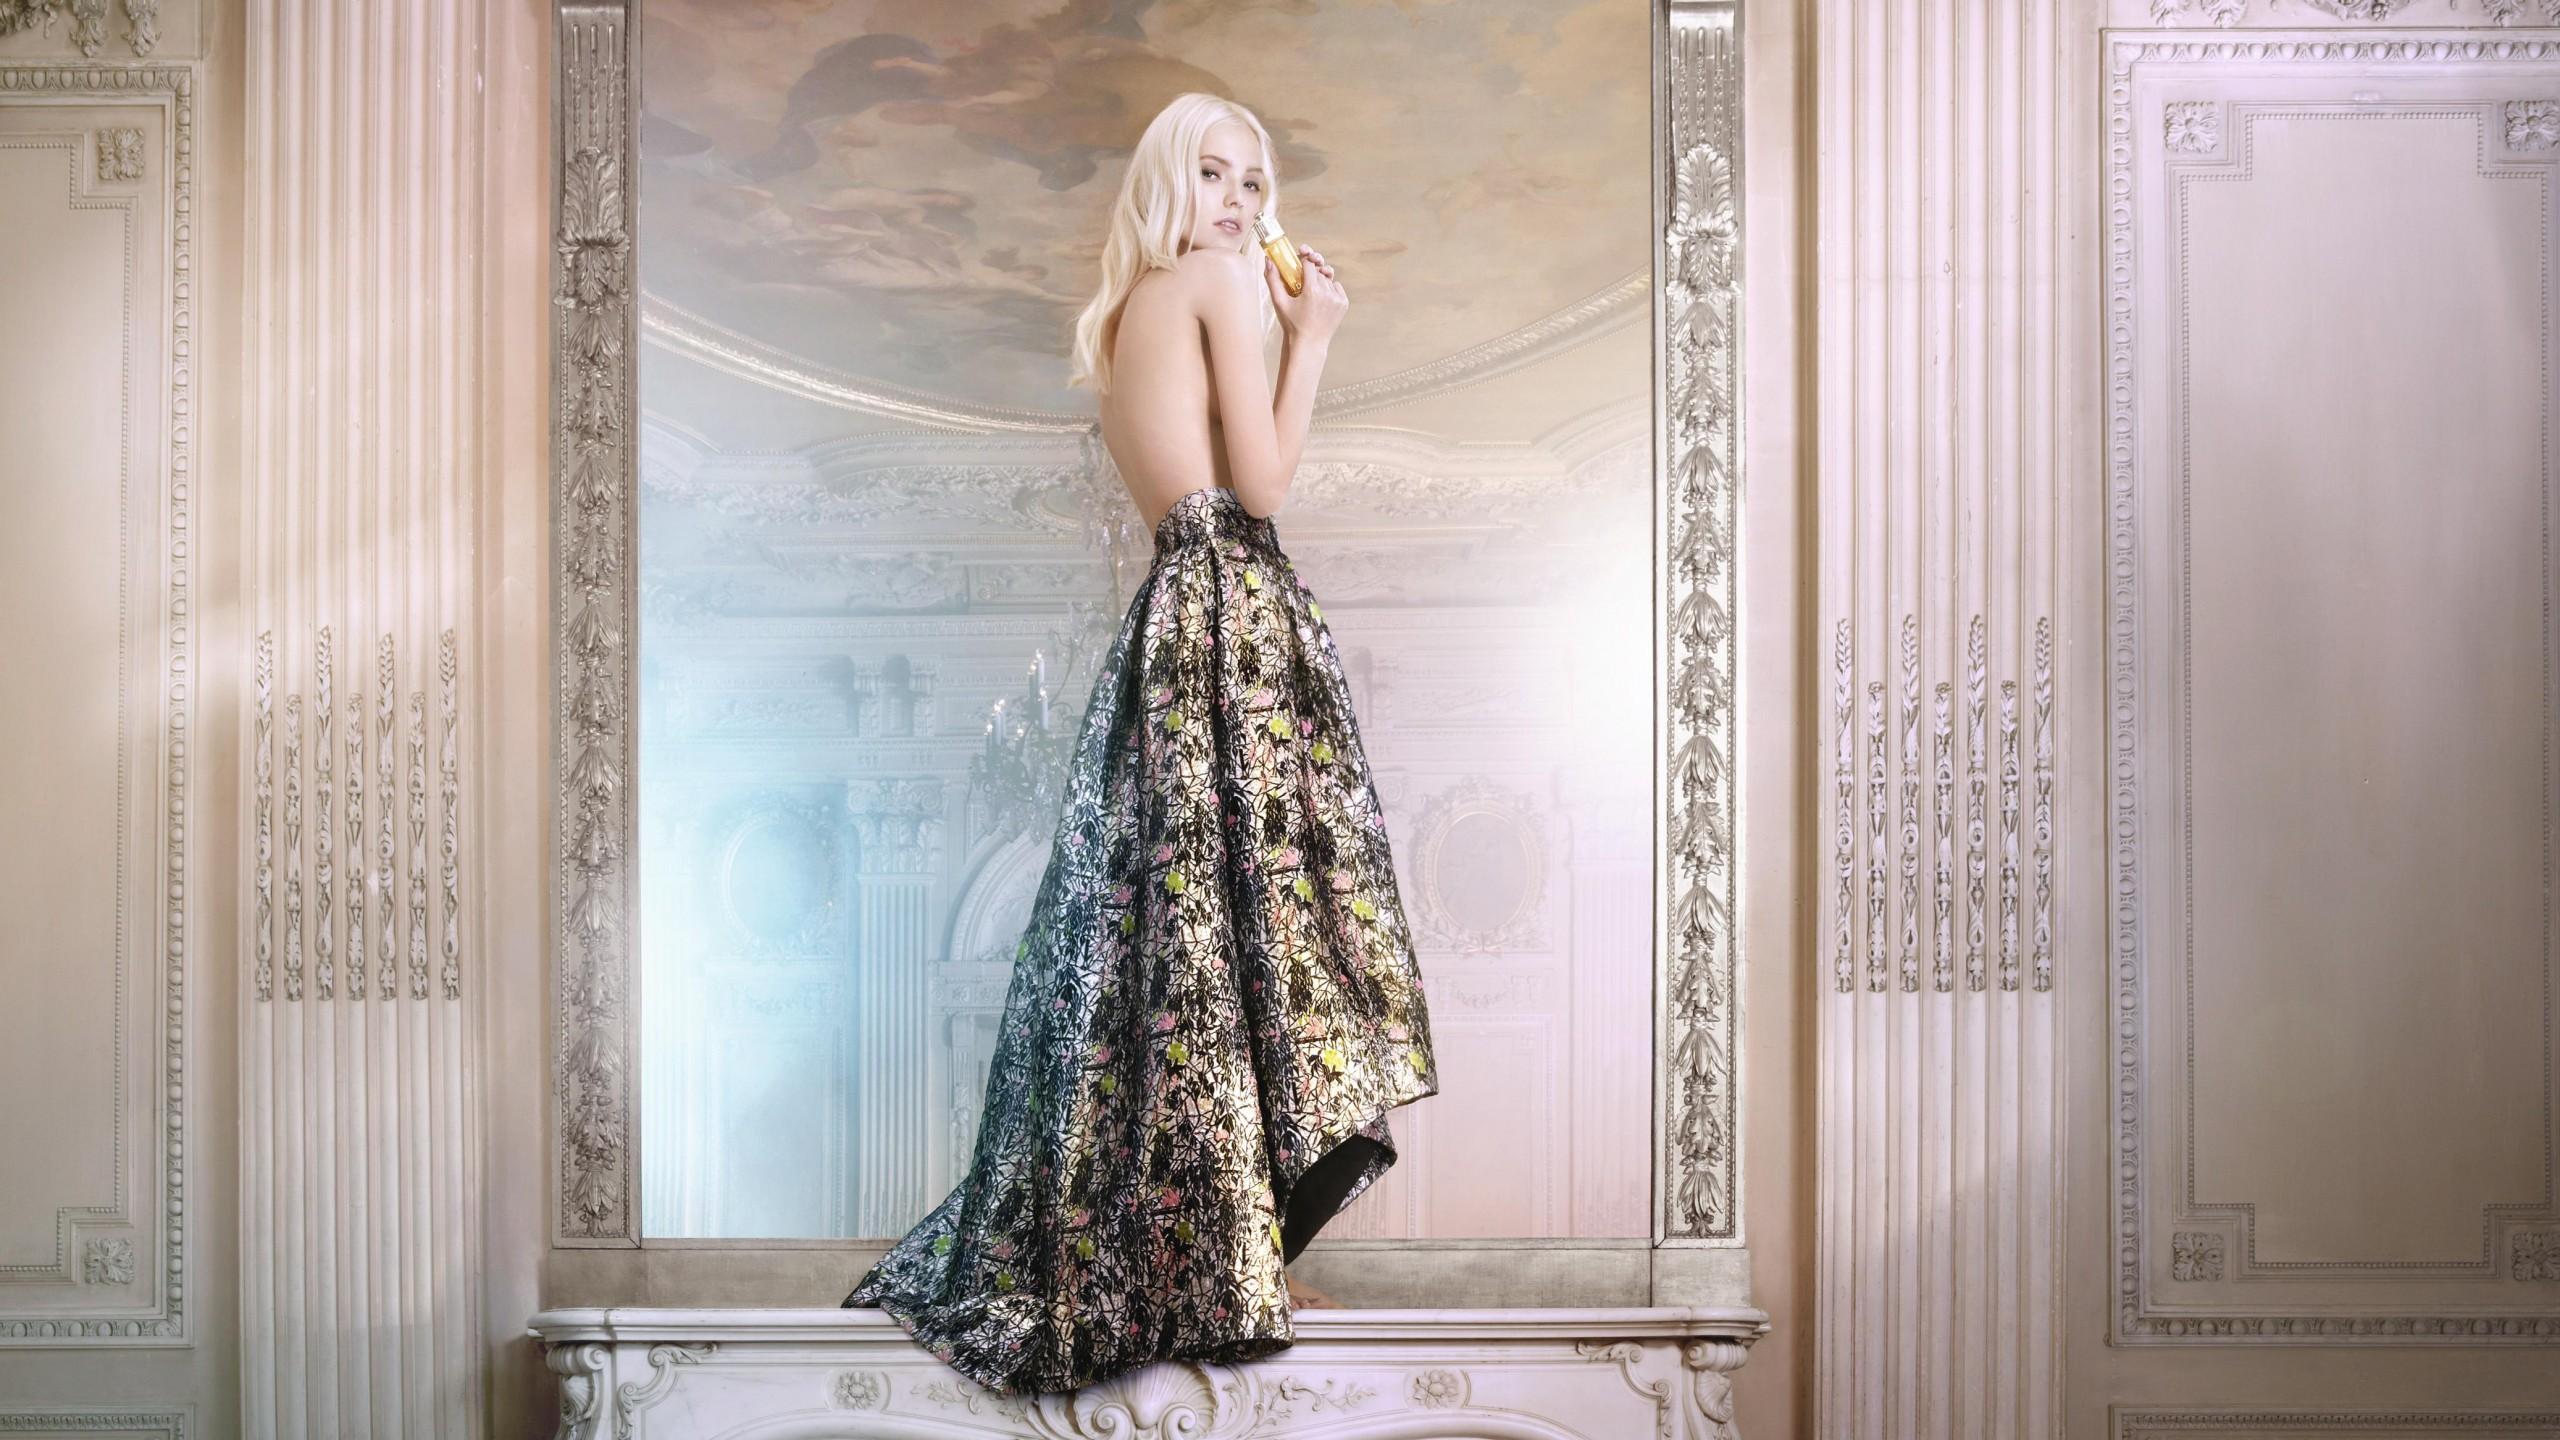 White Malibu Car >> Wallpaper Sasha Luss, Top Fashion Models 2015, model ...